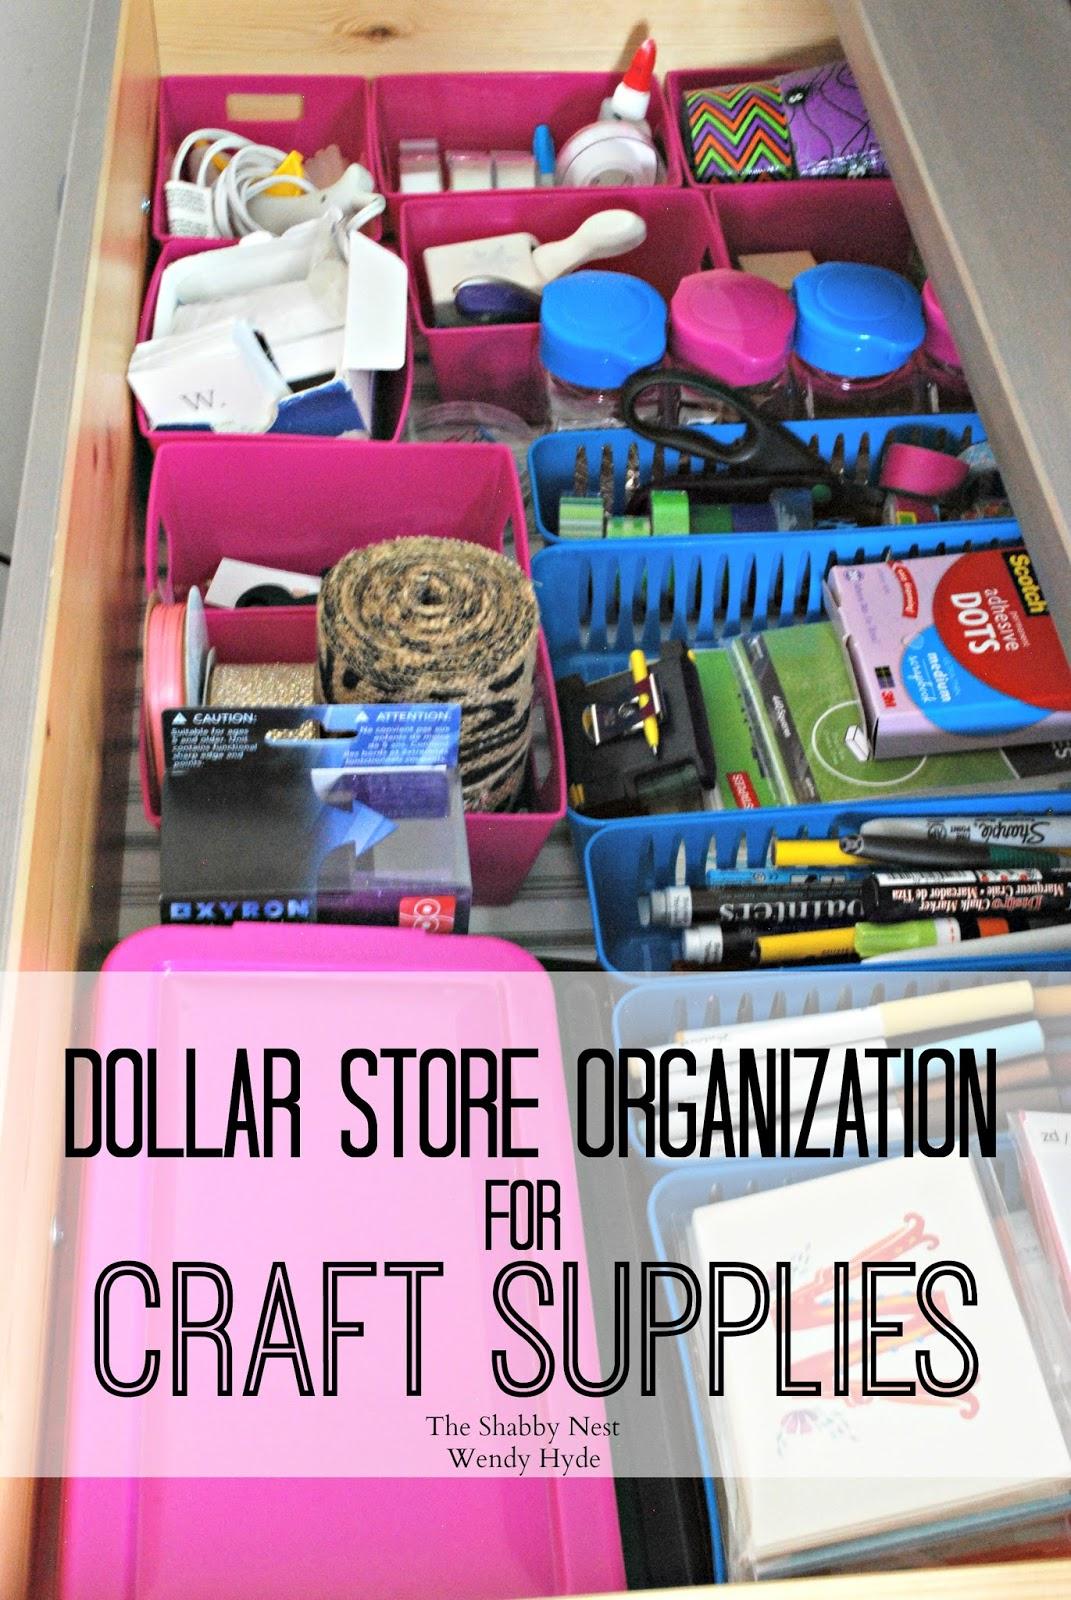 Dollar Store Organization For Craft Supplies